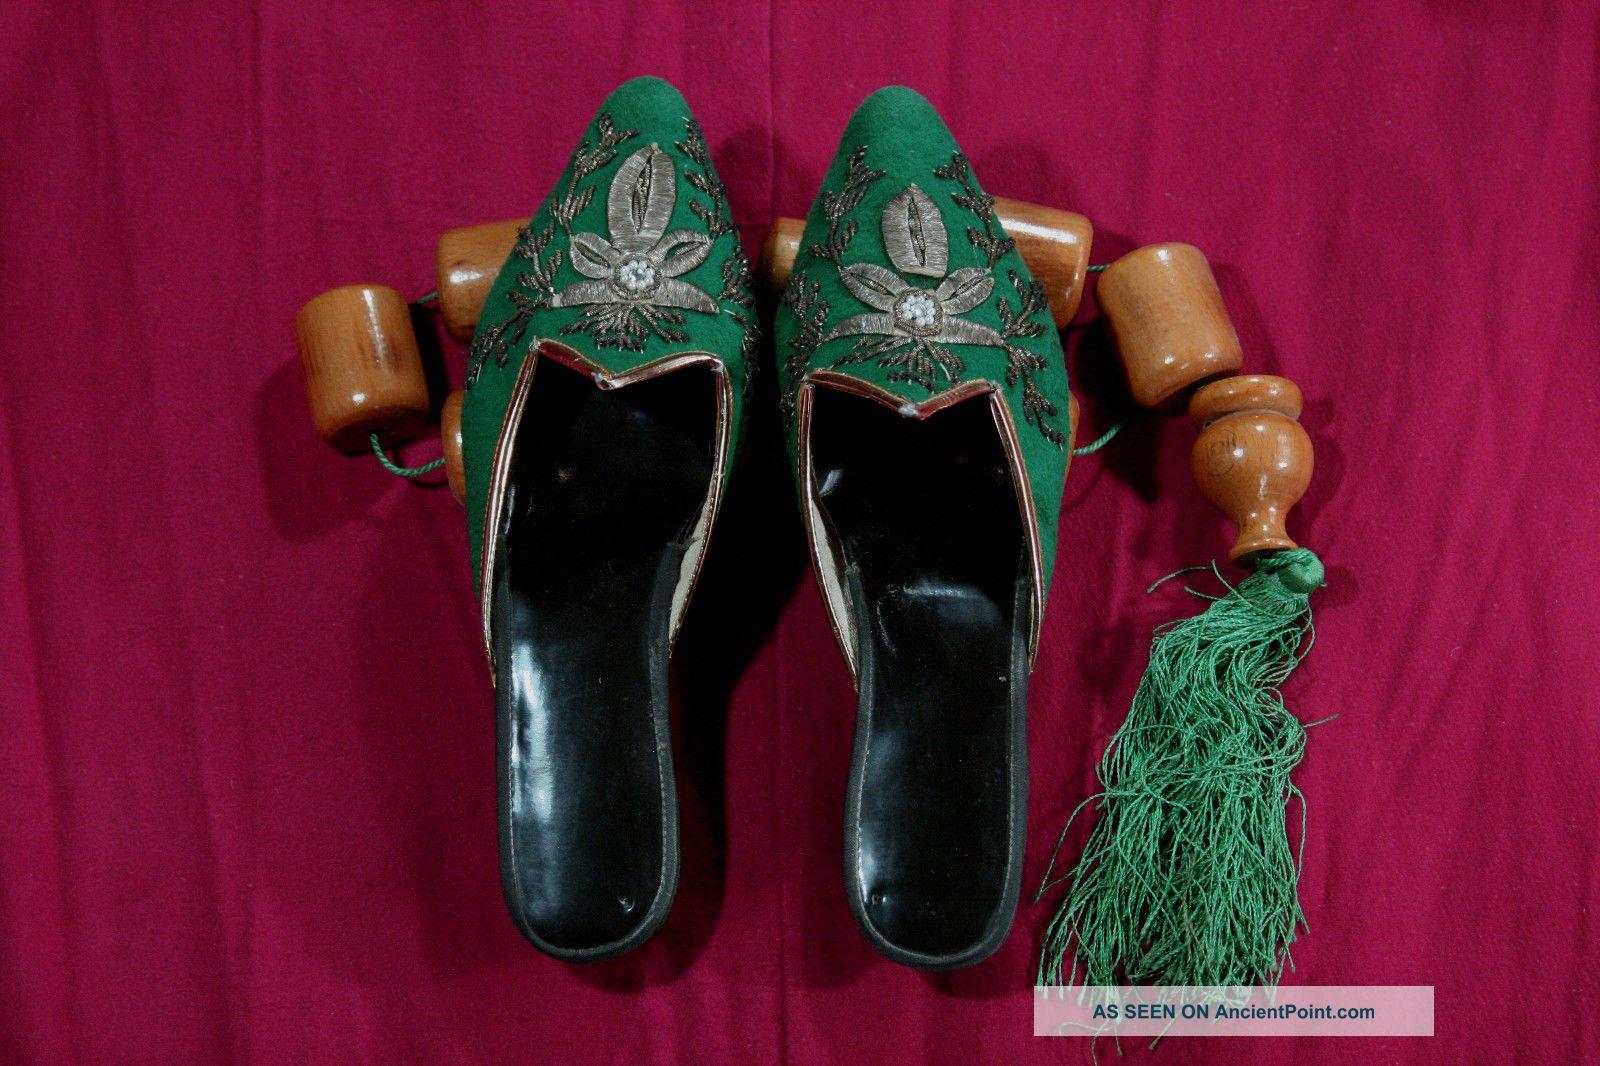 Antique Unique Handmade Ottoman 19th C Women Slippers Wool Silver Thread Design Islamic photo